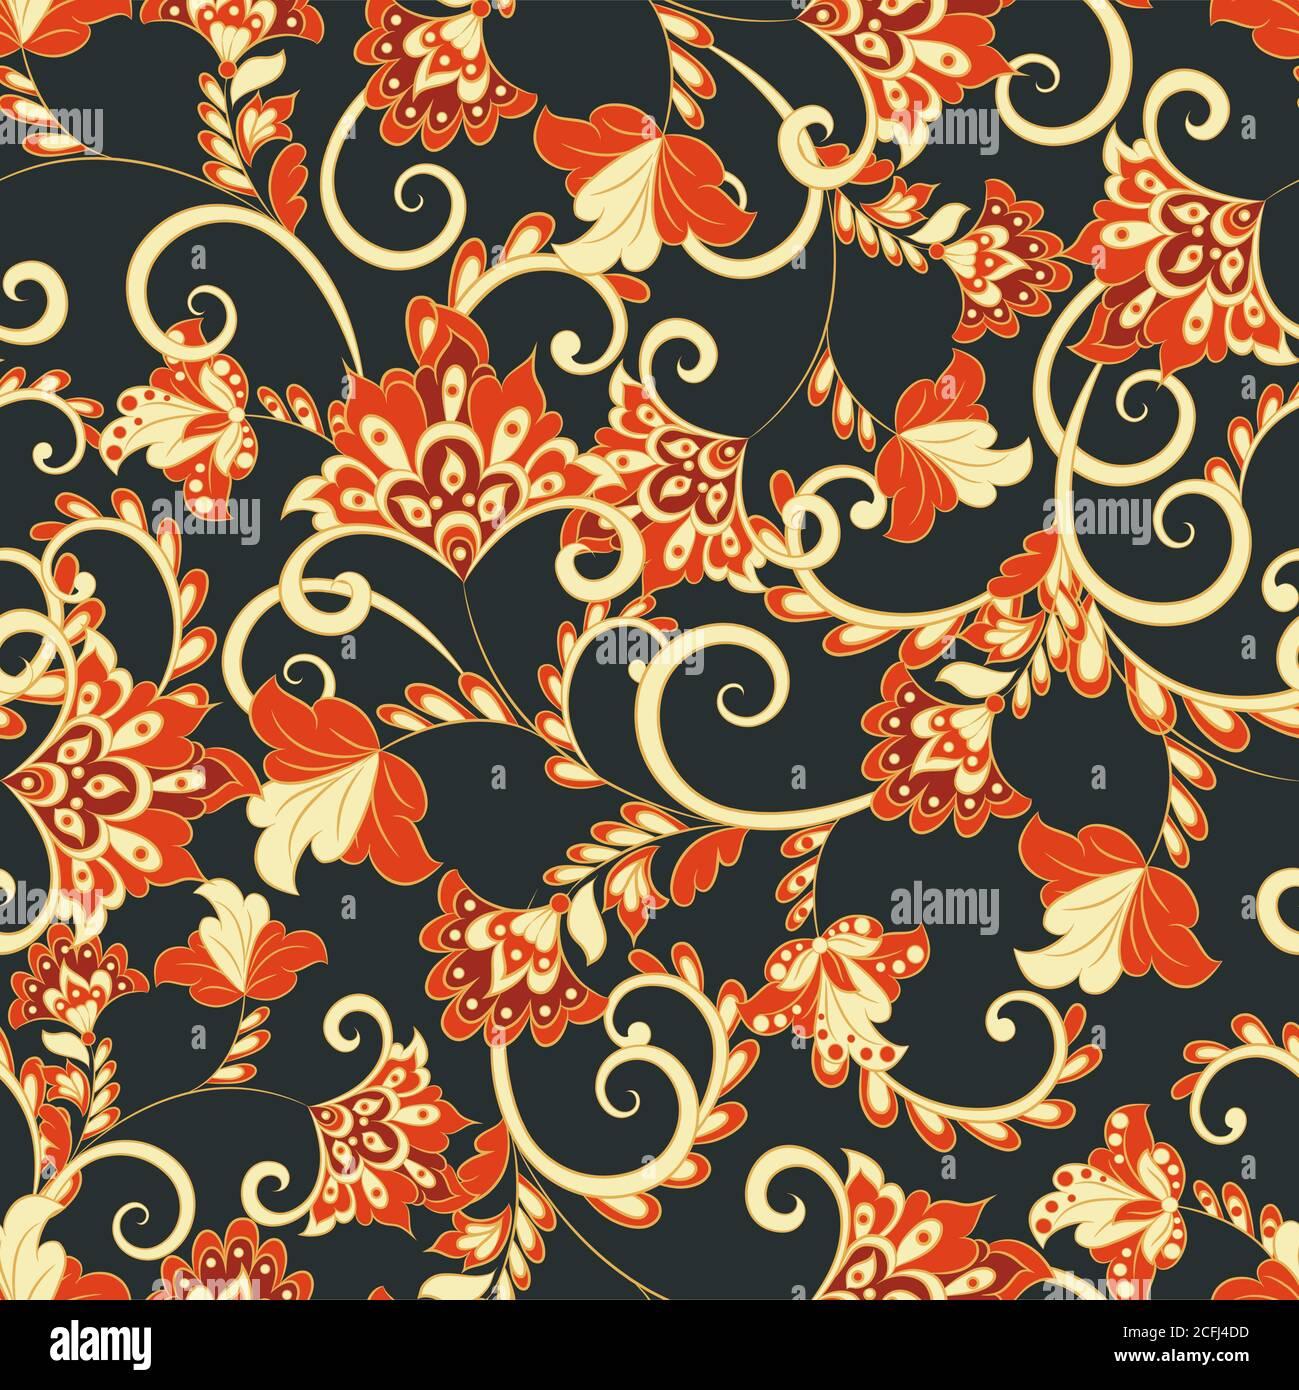 Vintage Floral Seamless Pattern Vector Wallpaper Stock Vector Image Art Alamy